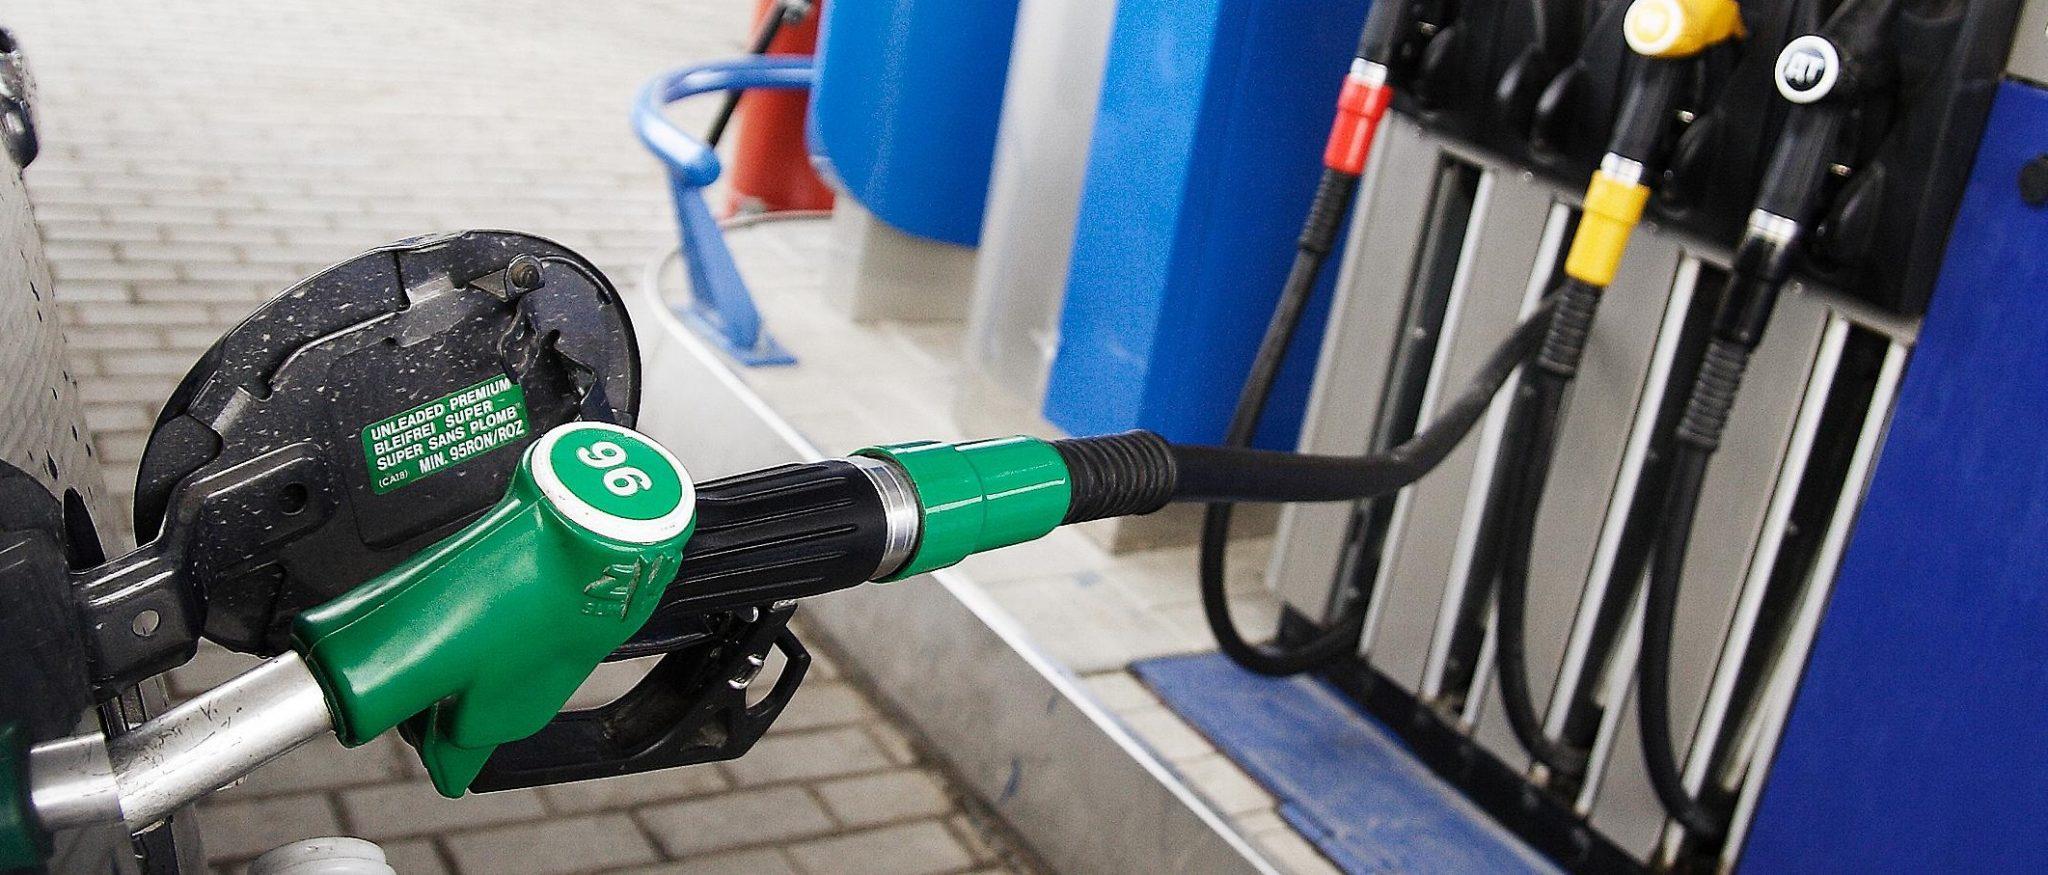 система gps мониторинга и контроля расхода топлива